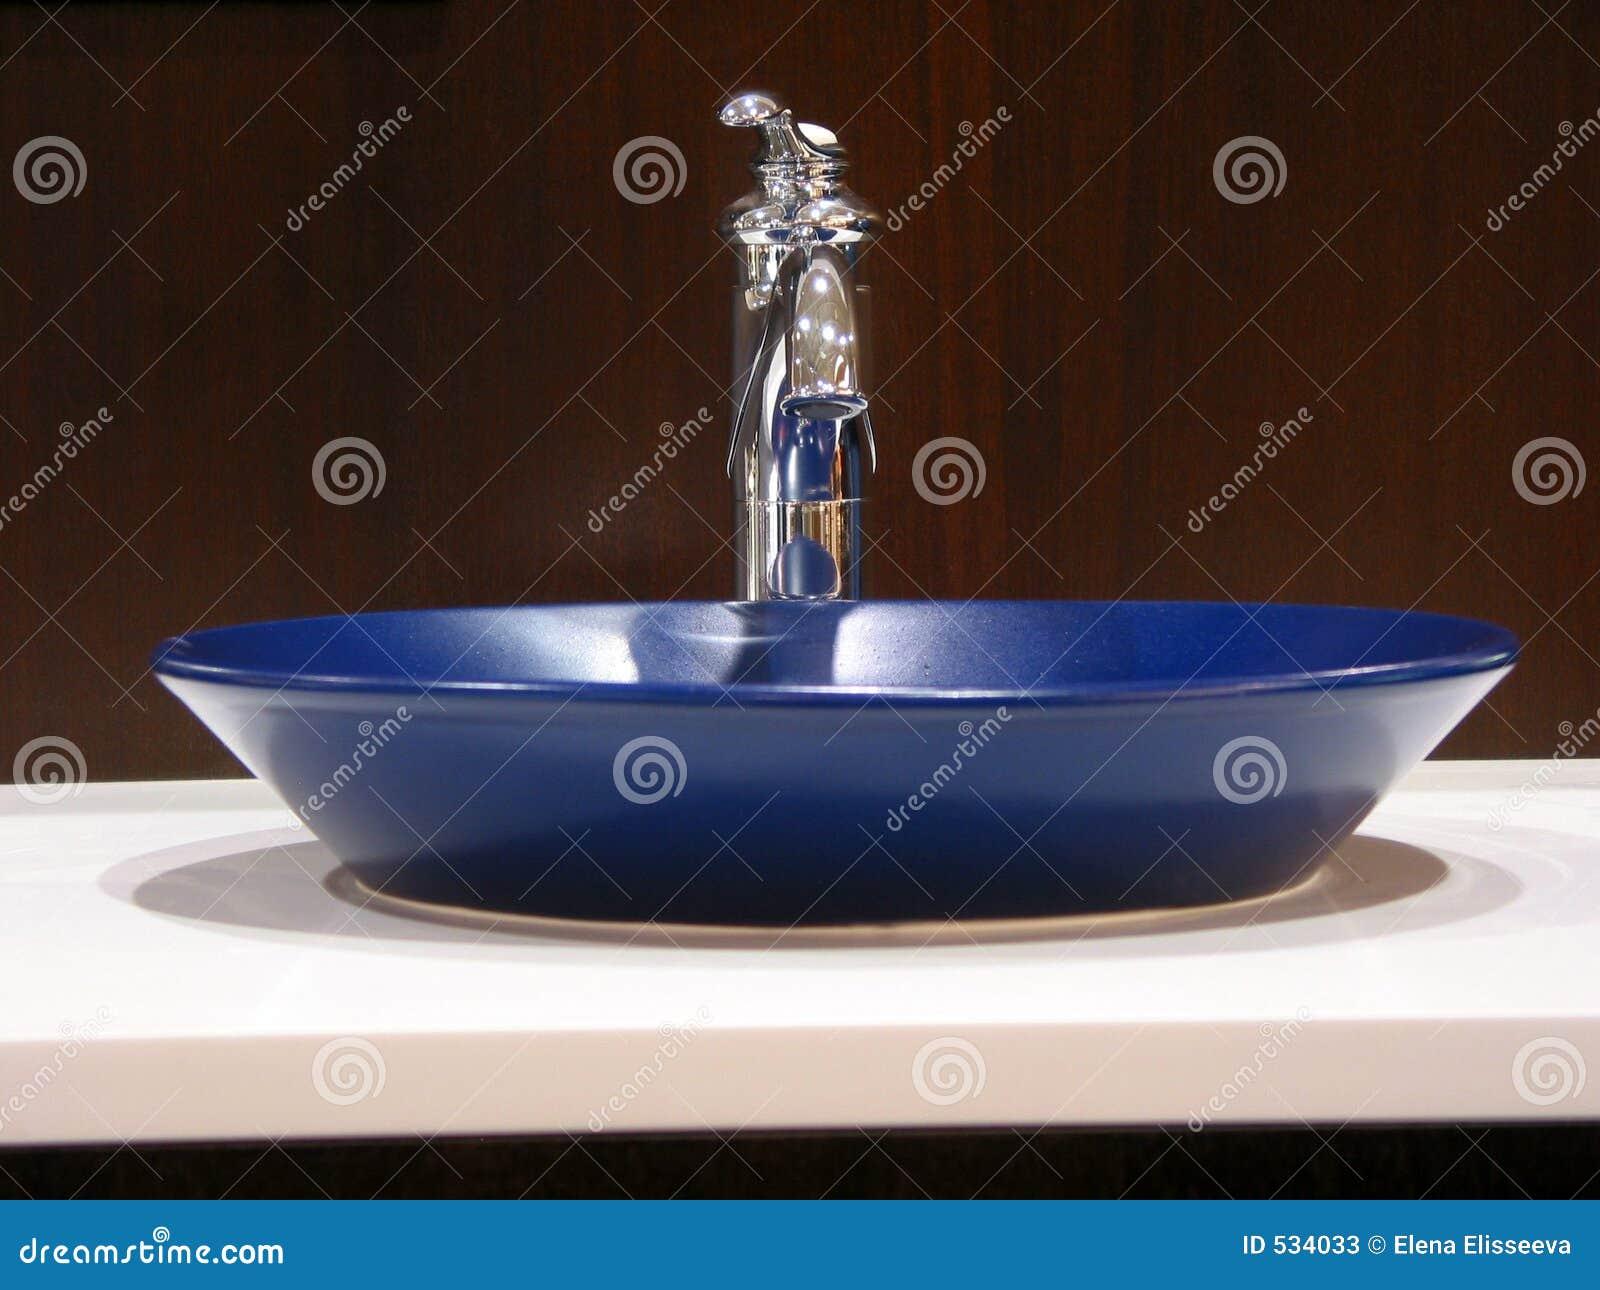 Download 卫生间现代水槽 库存图片. 图片 包括有 反映, 洗涤物, 管道, 水槽, 现代, bastien, 耐洗, 内部 - 534033